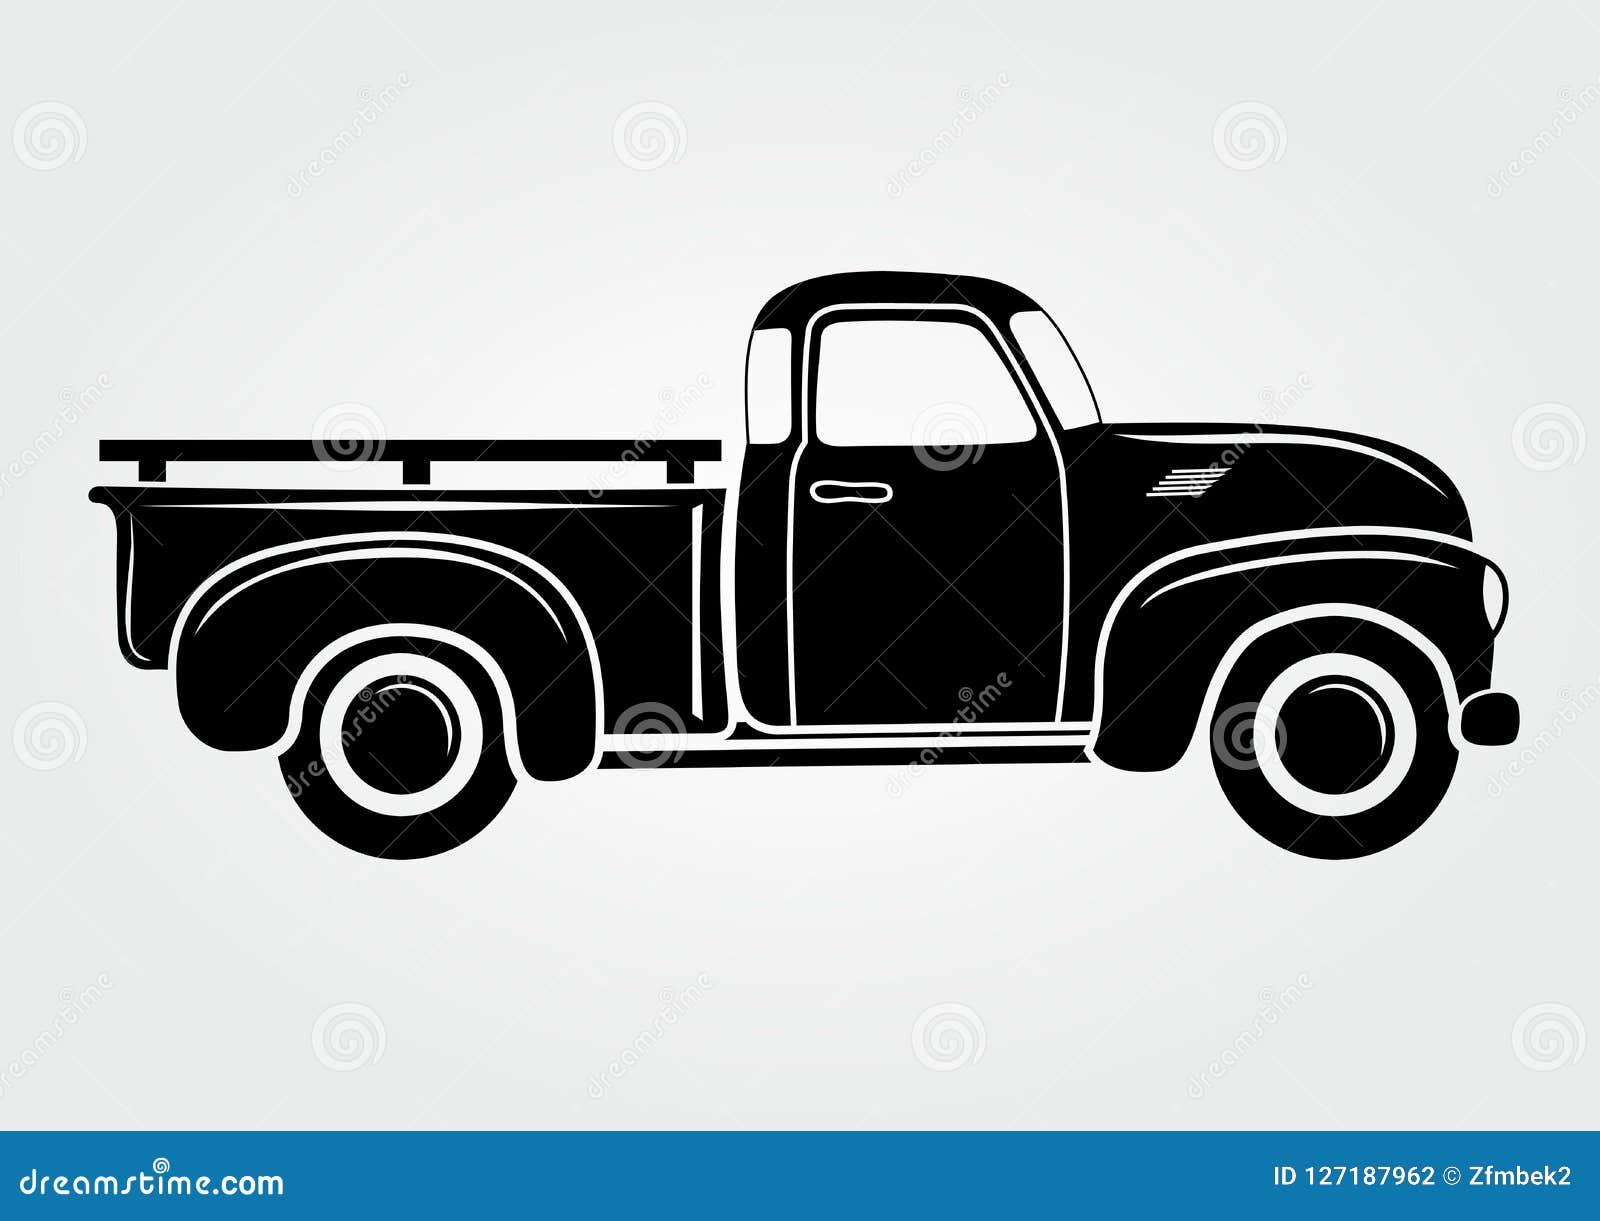 Pickup Truck Stock Illustrations 12 546 Pickup Truck Stock Illustrations Vectors Clipart Dreamstime